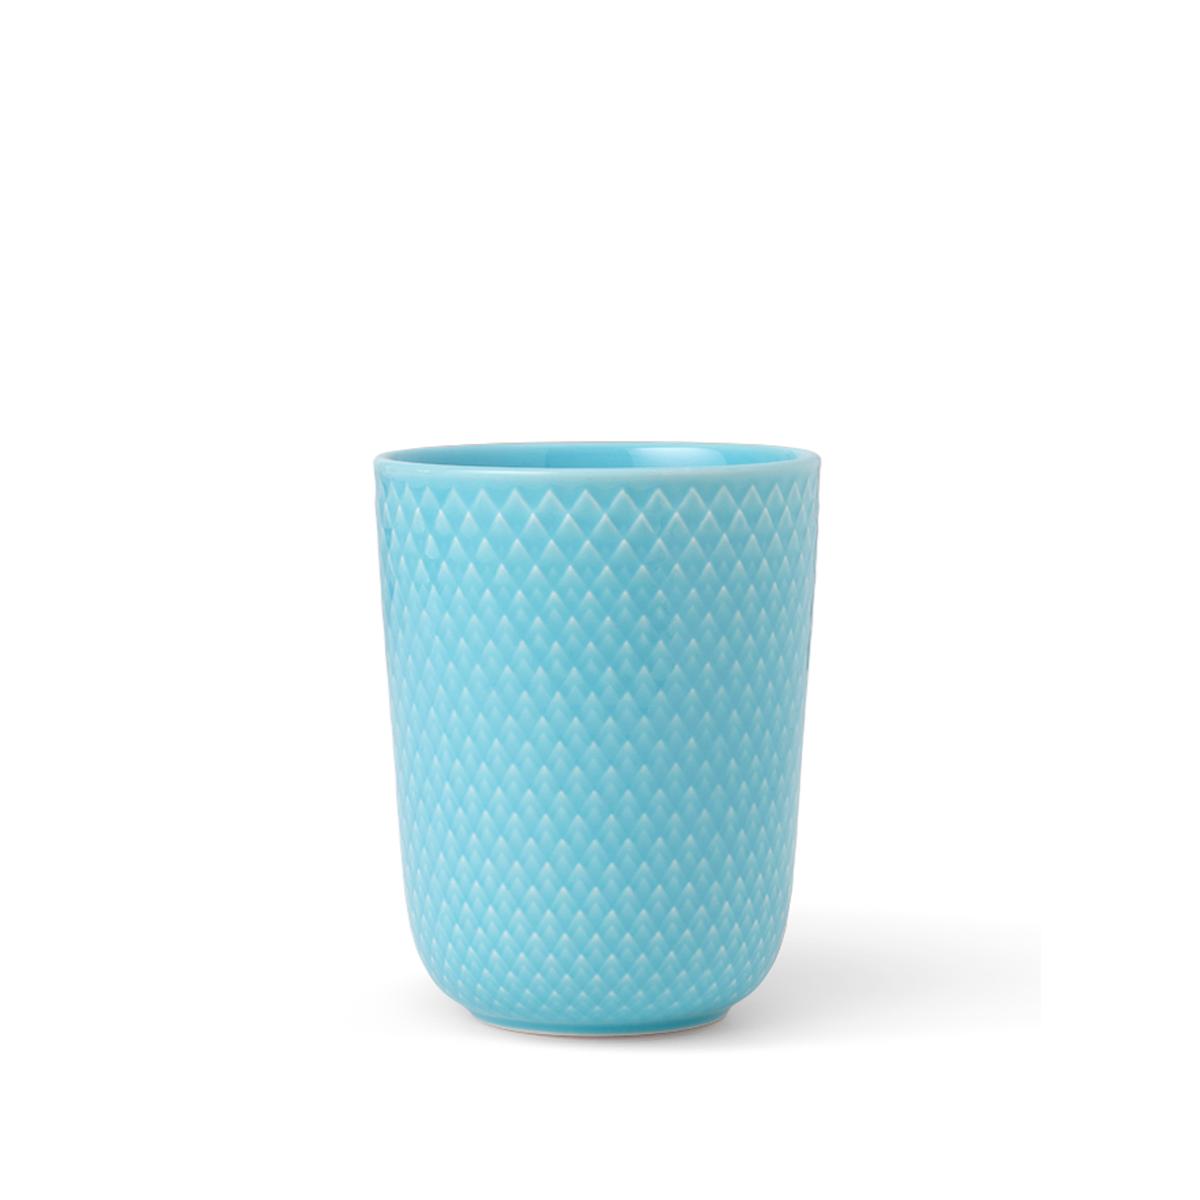 Lyngby Porcelæn - Rhombe Mug 33 cl - Turquoise (201967)